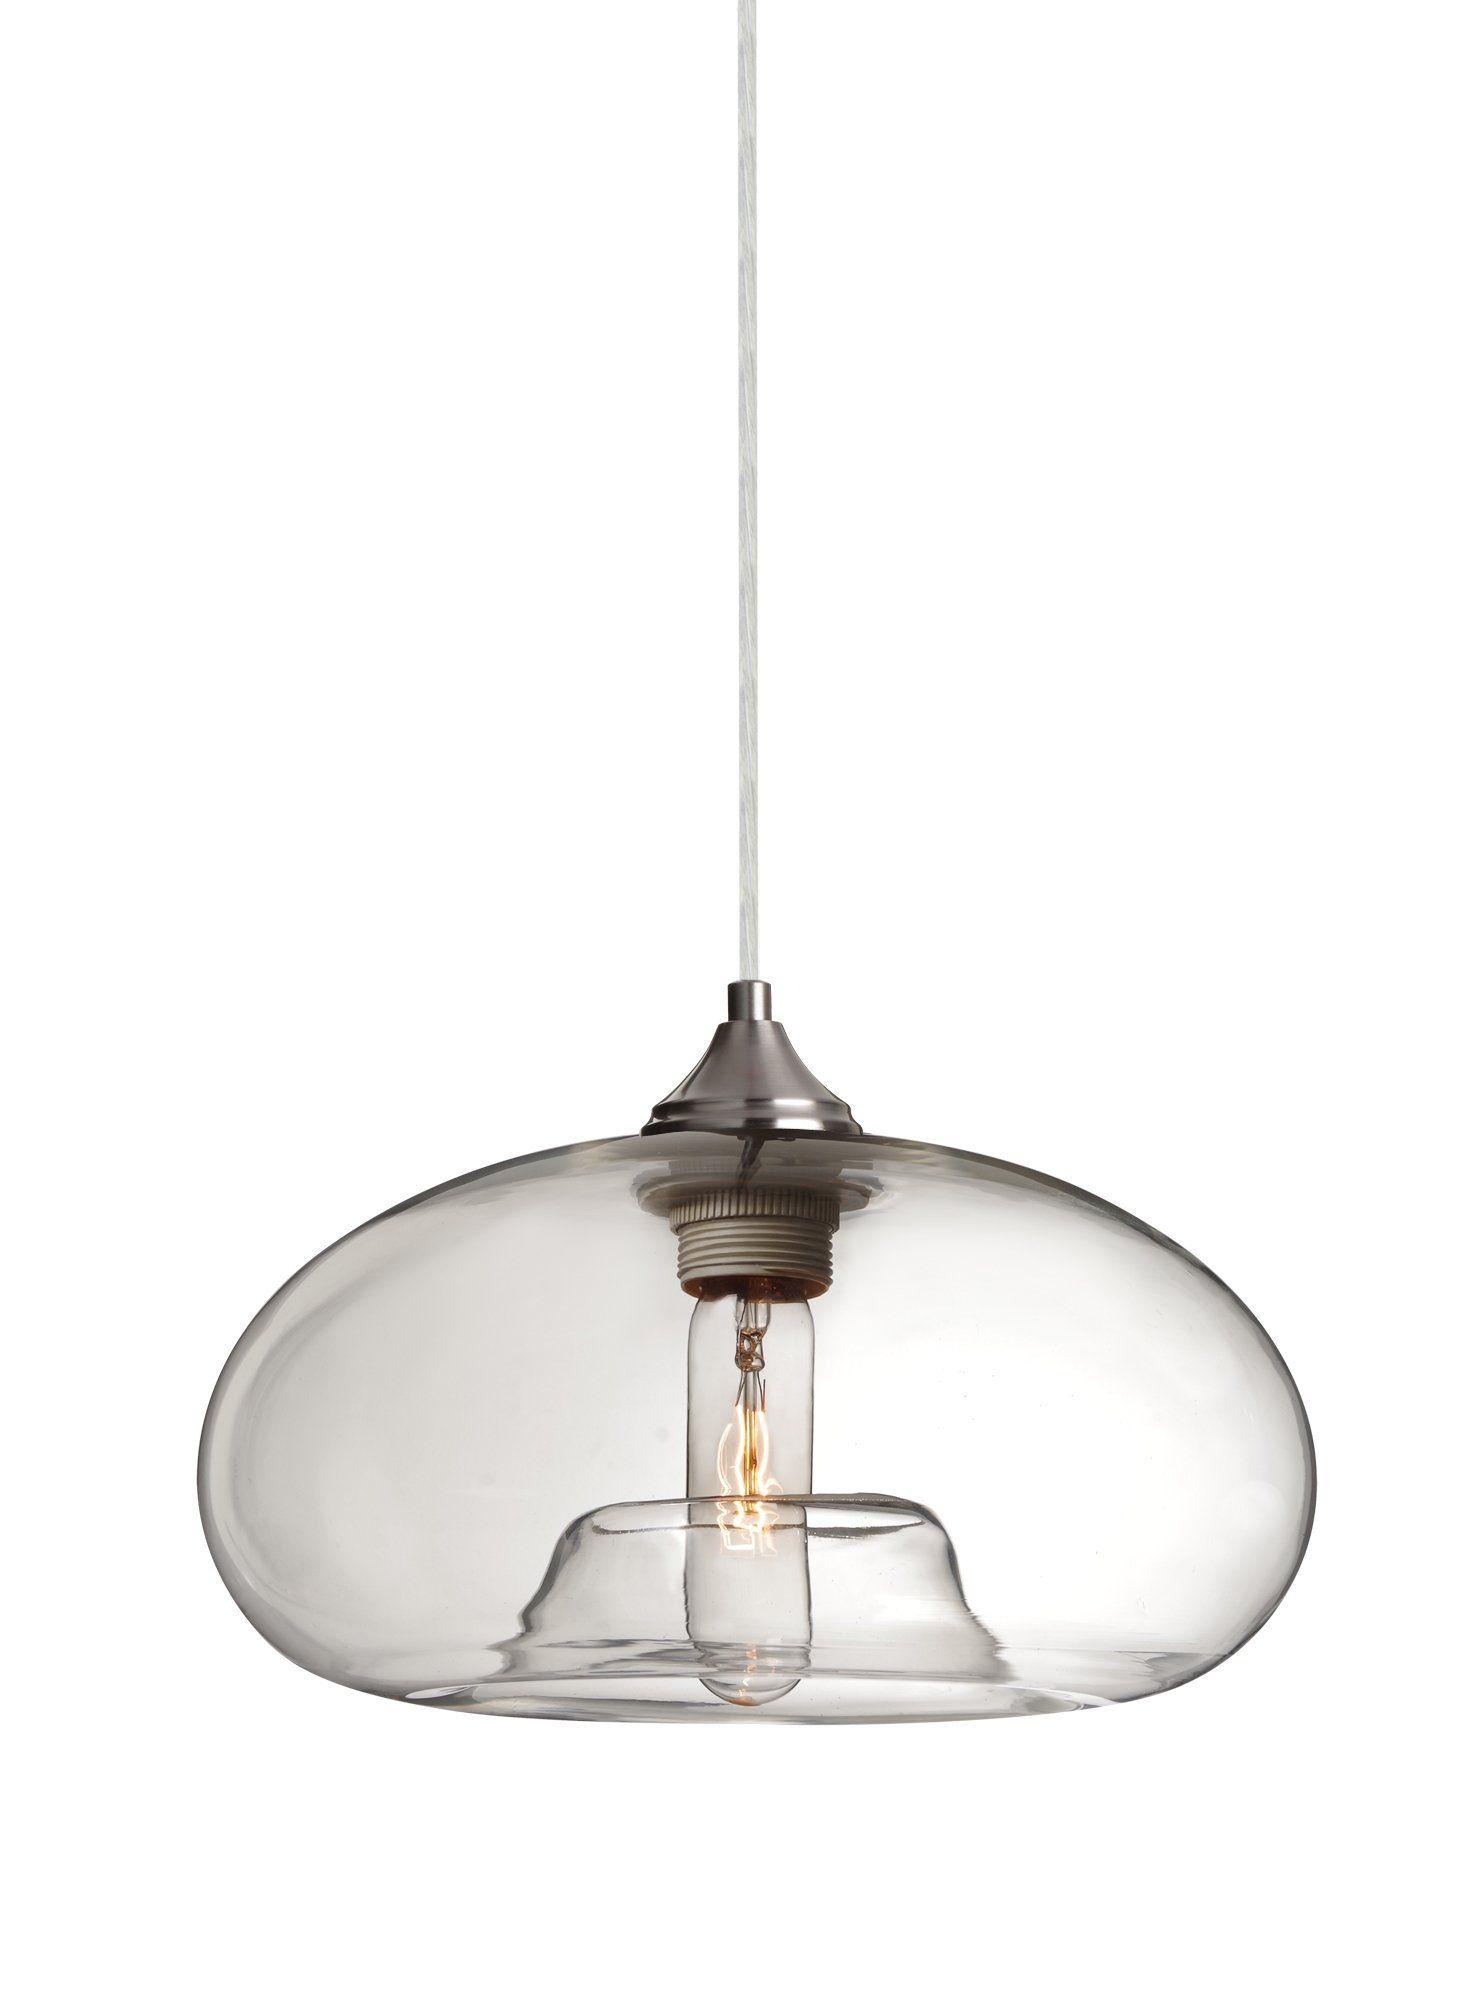 Bana 1-Light Geometric Pendant   Products   Lighting inside 1-Light Geometric Globe Pendants (Image 9 of 30)